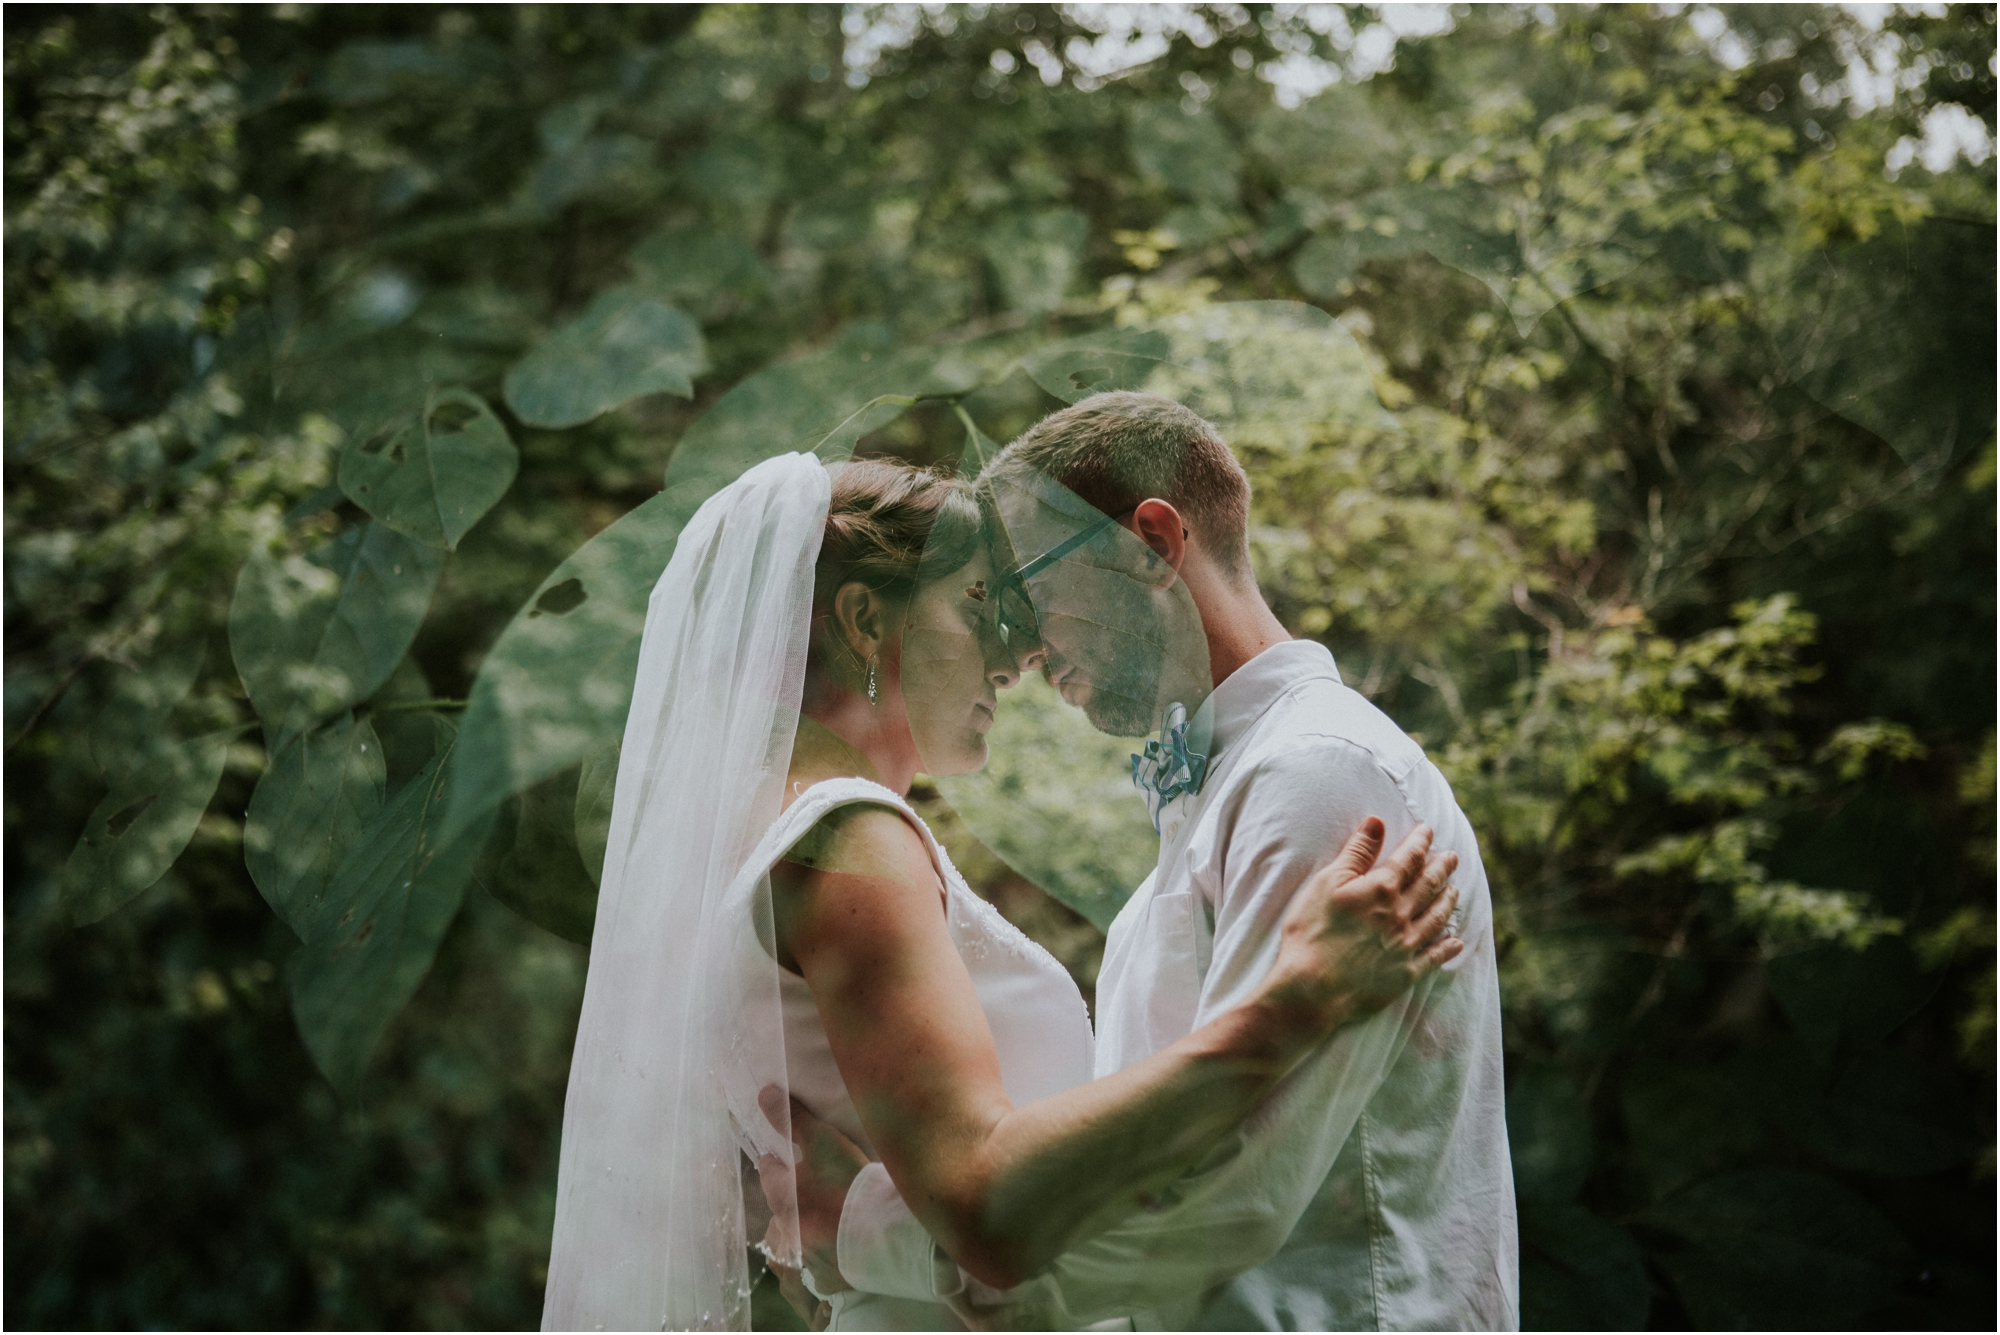 sugar-hollow-park-bristol-virginia-wedding-intimate-woodsy-black-forest-ceremony-adventurous-couple_0092.jpg